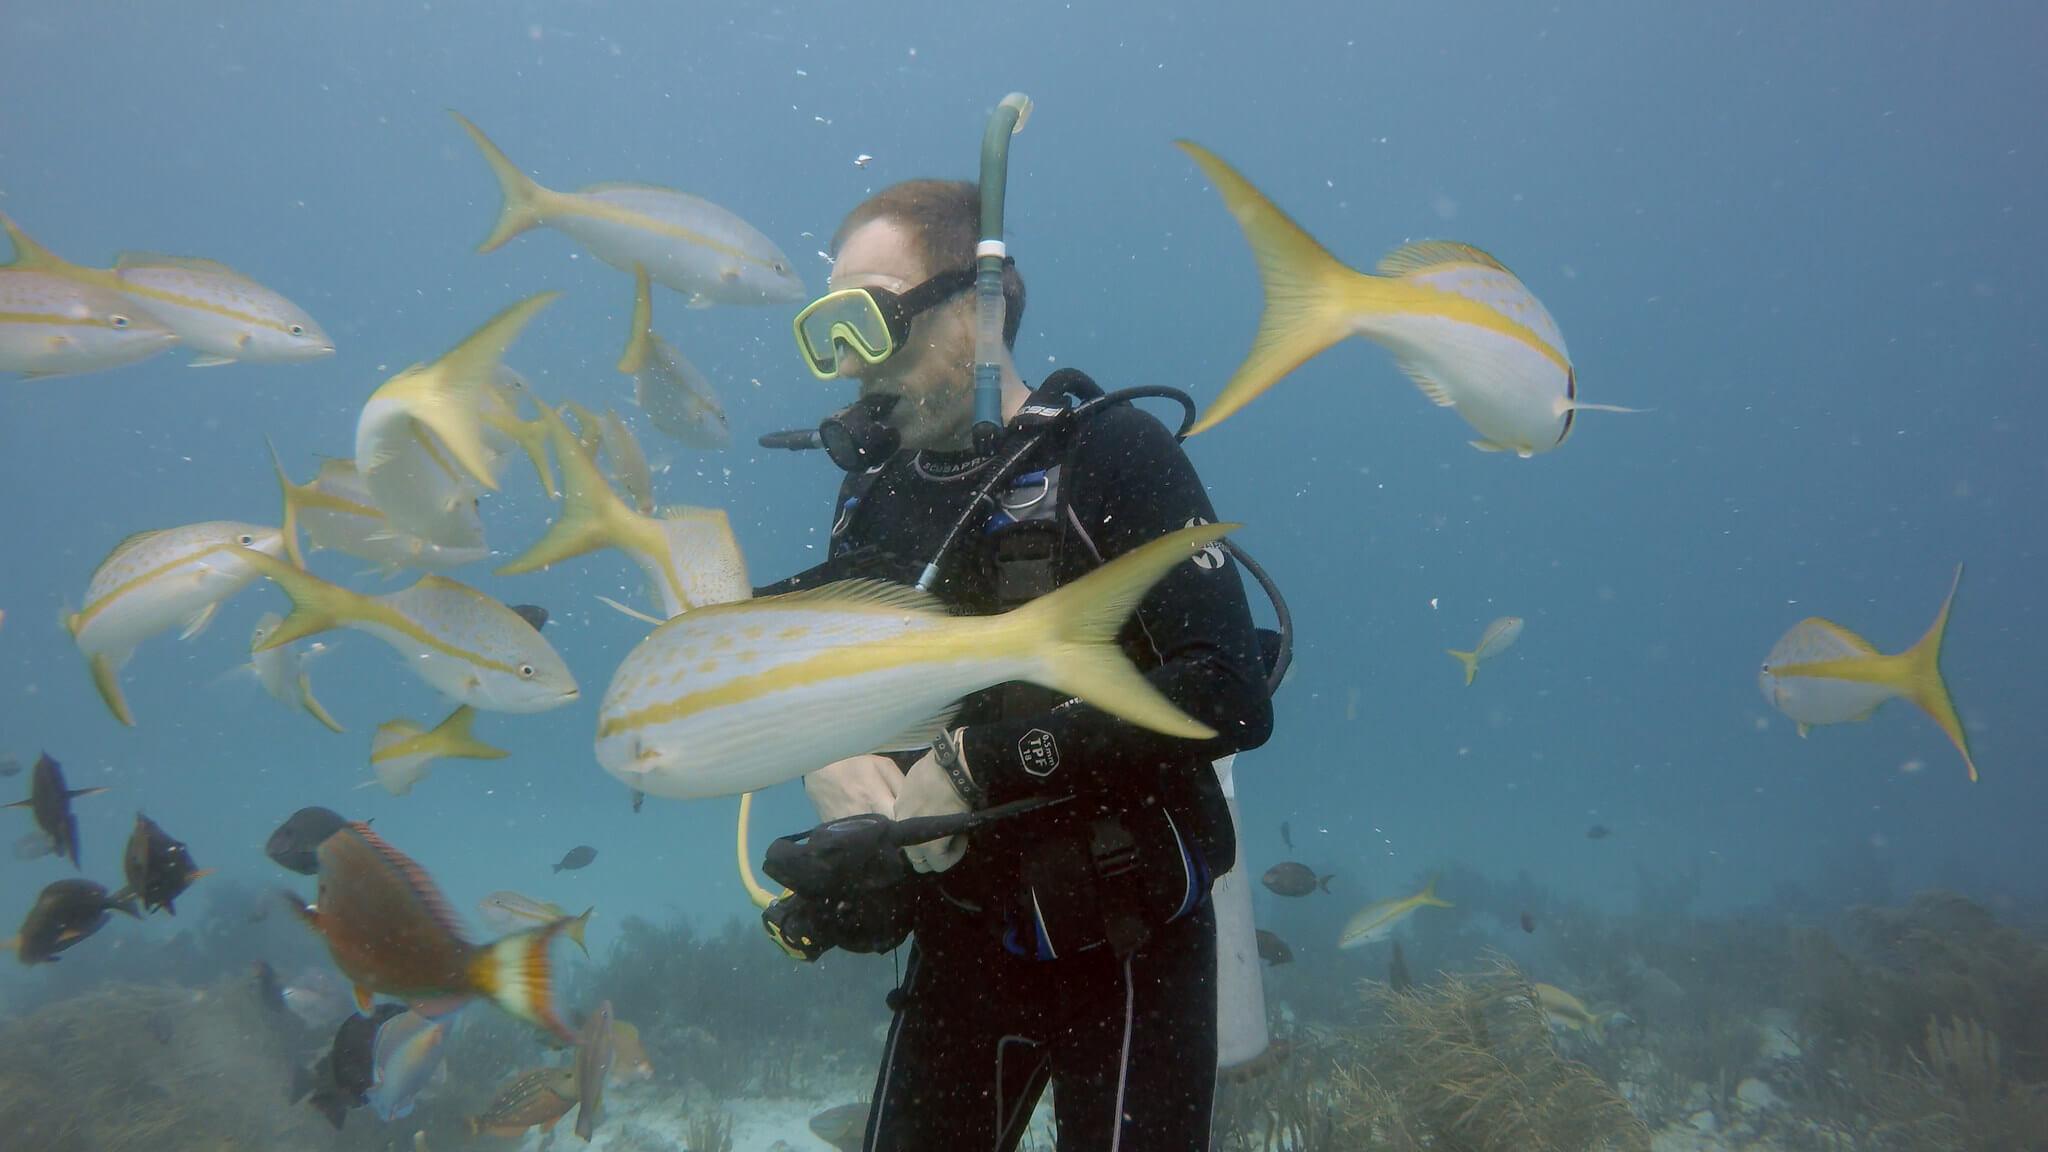 Rob Carter underwater SCUBA diving